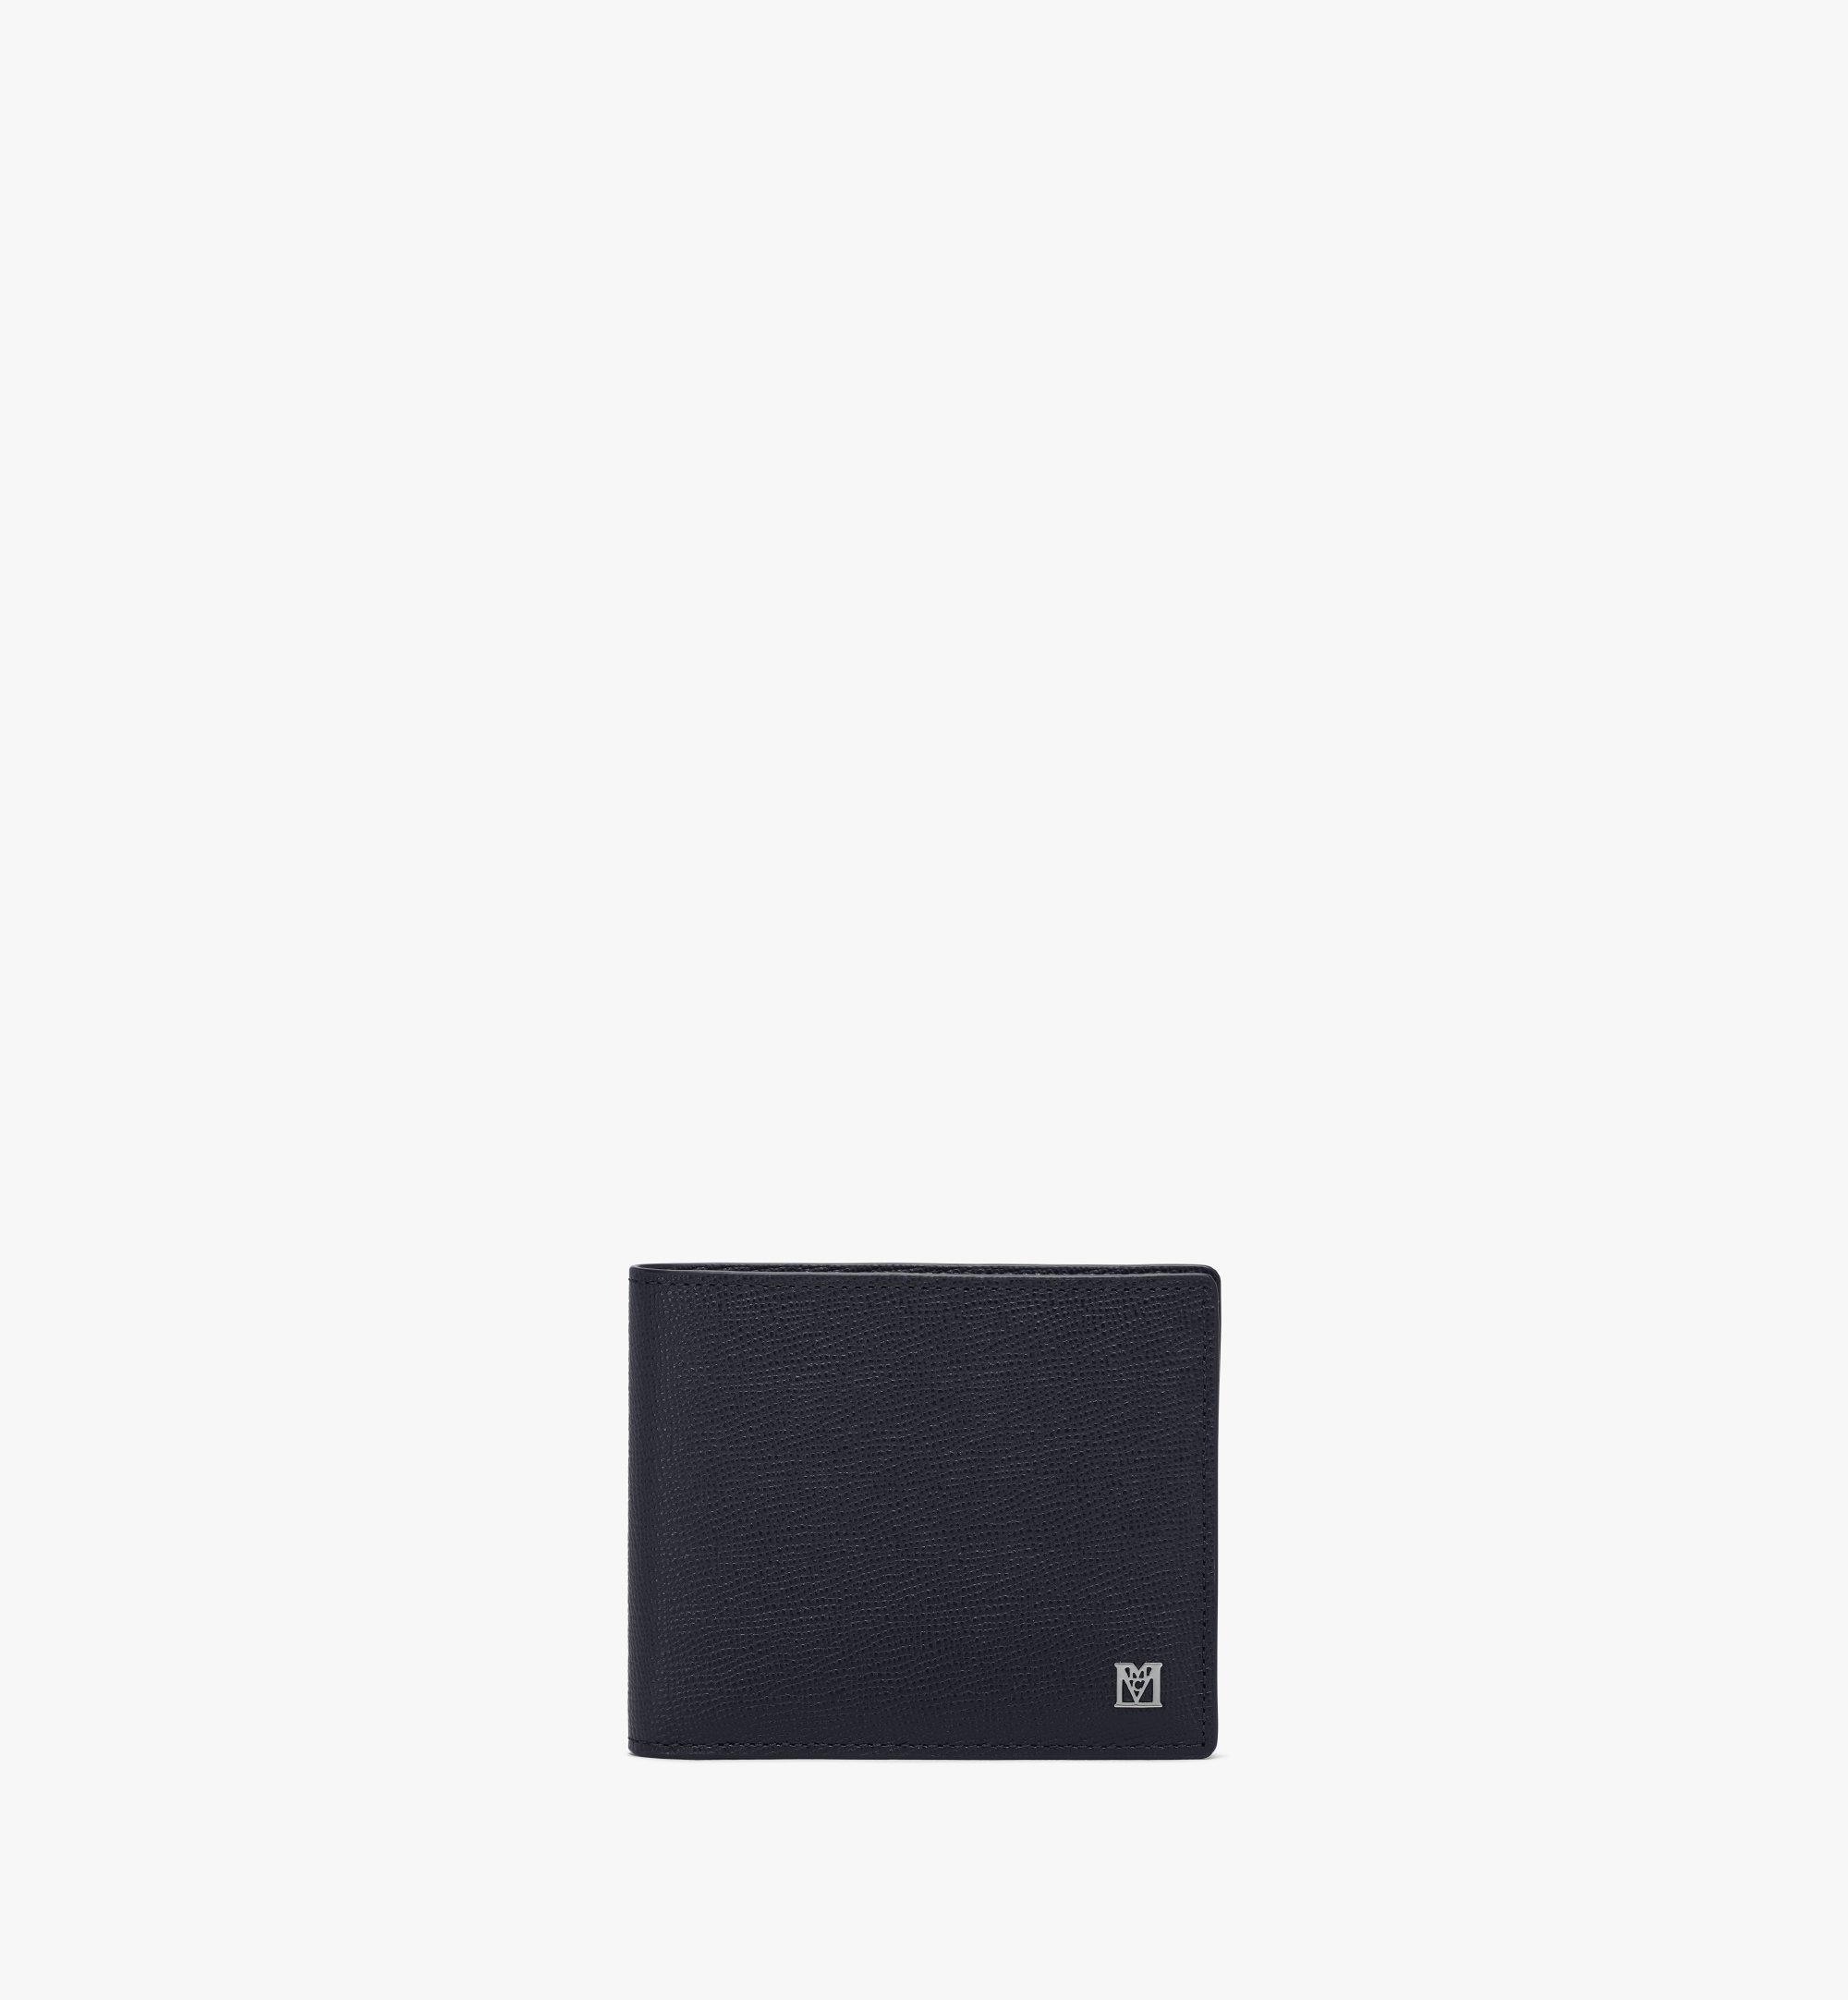 MCM Mena Bifold Wallet Black MXSAALM01BK001 Alternate View 1